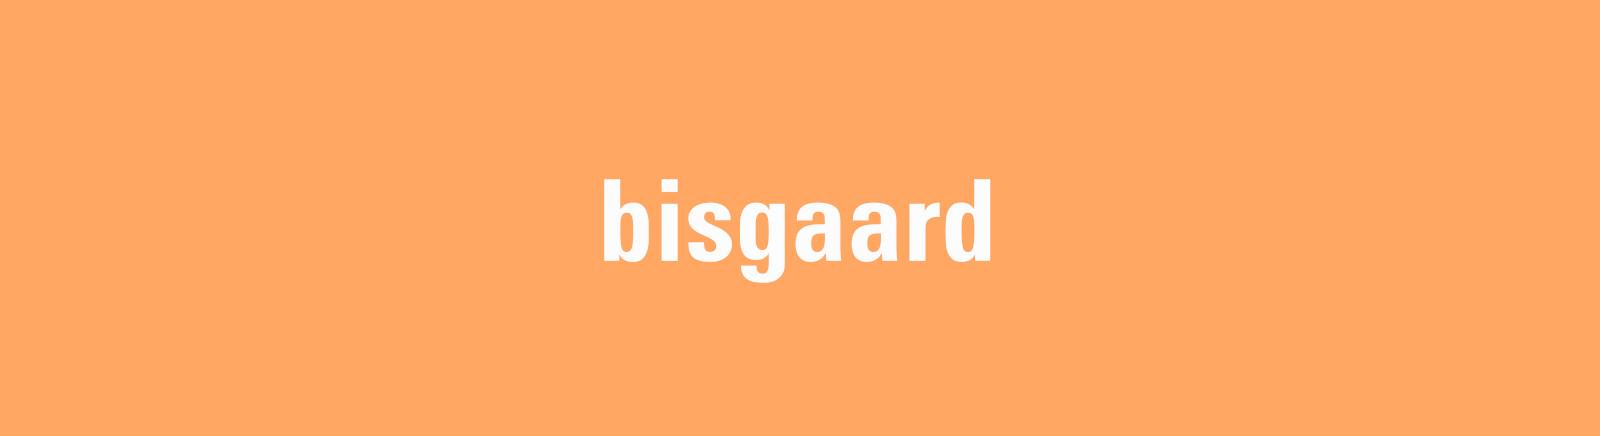 Bisgaard Markenschuhe online entdecken im Juppen Schuhe Shop